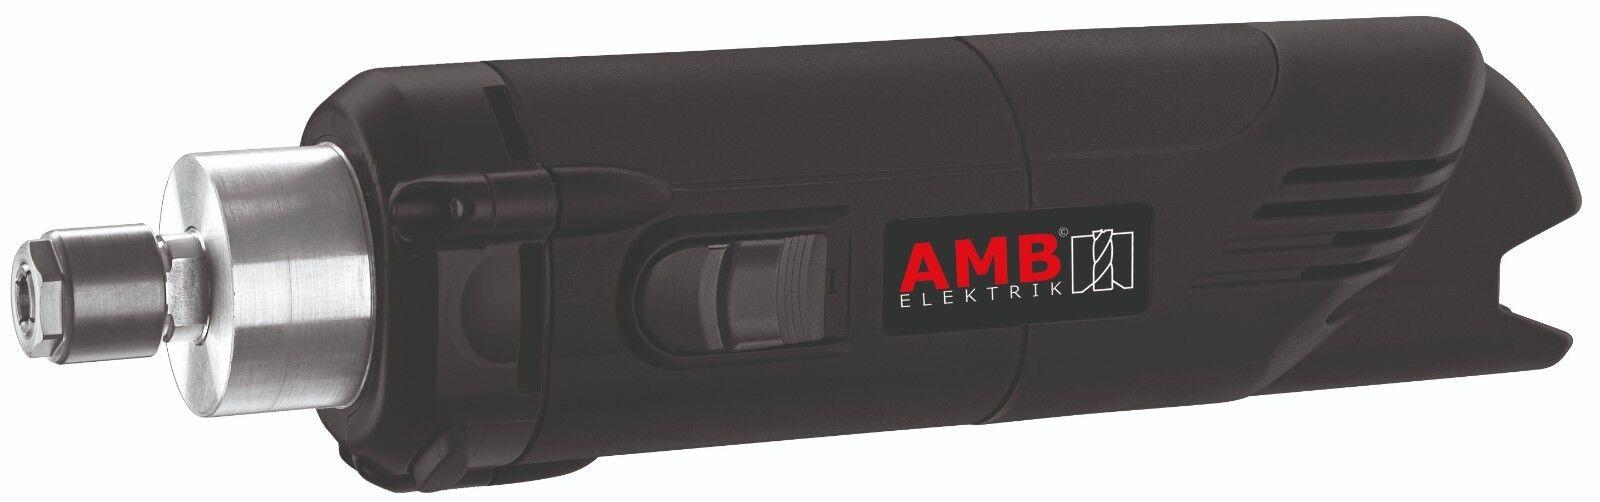 AMB 1050 FME-1 5000...25000 U/min W Fräsmotor / Schleifmotor Superset /Bj2018